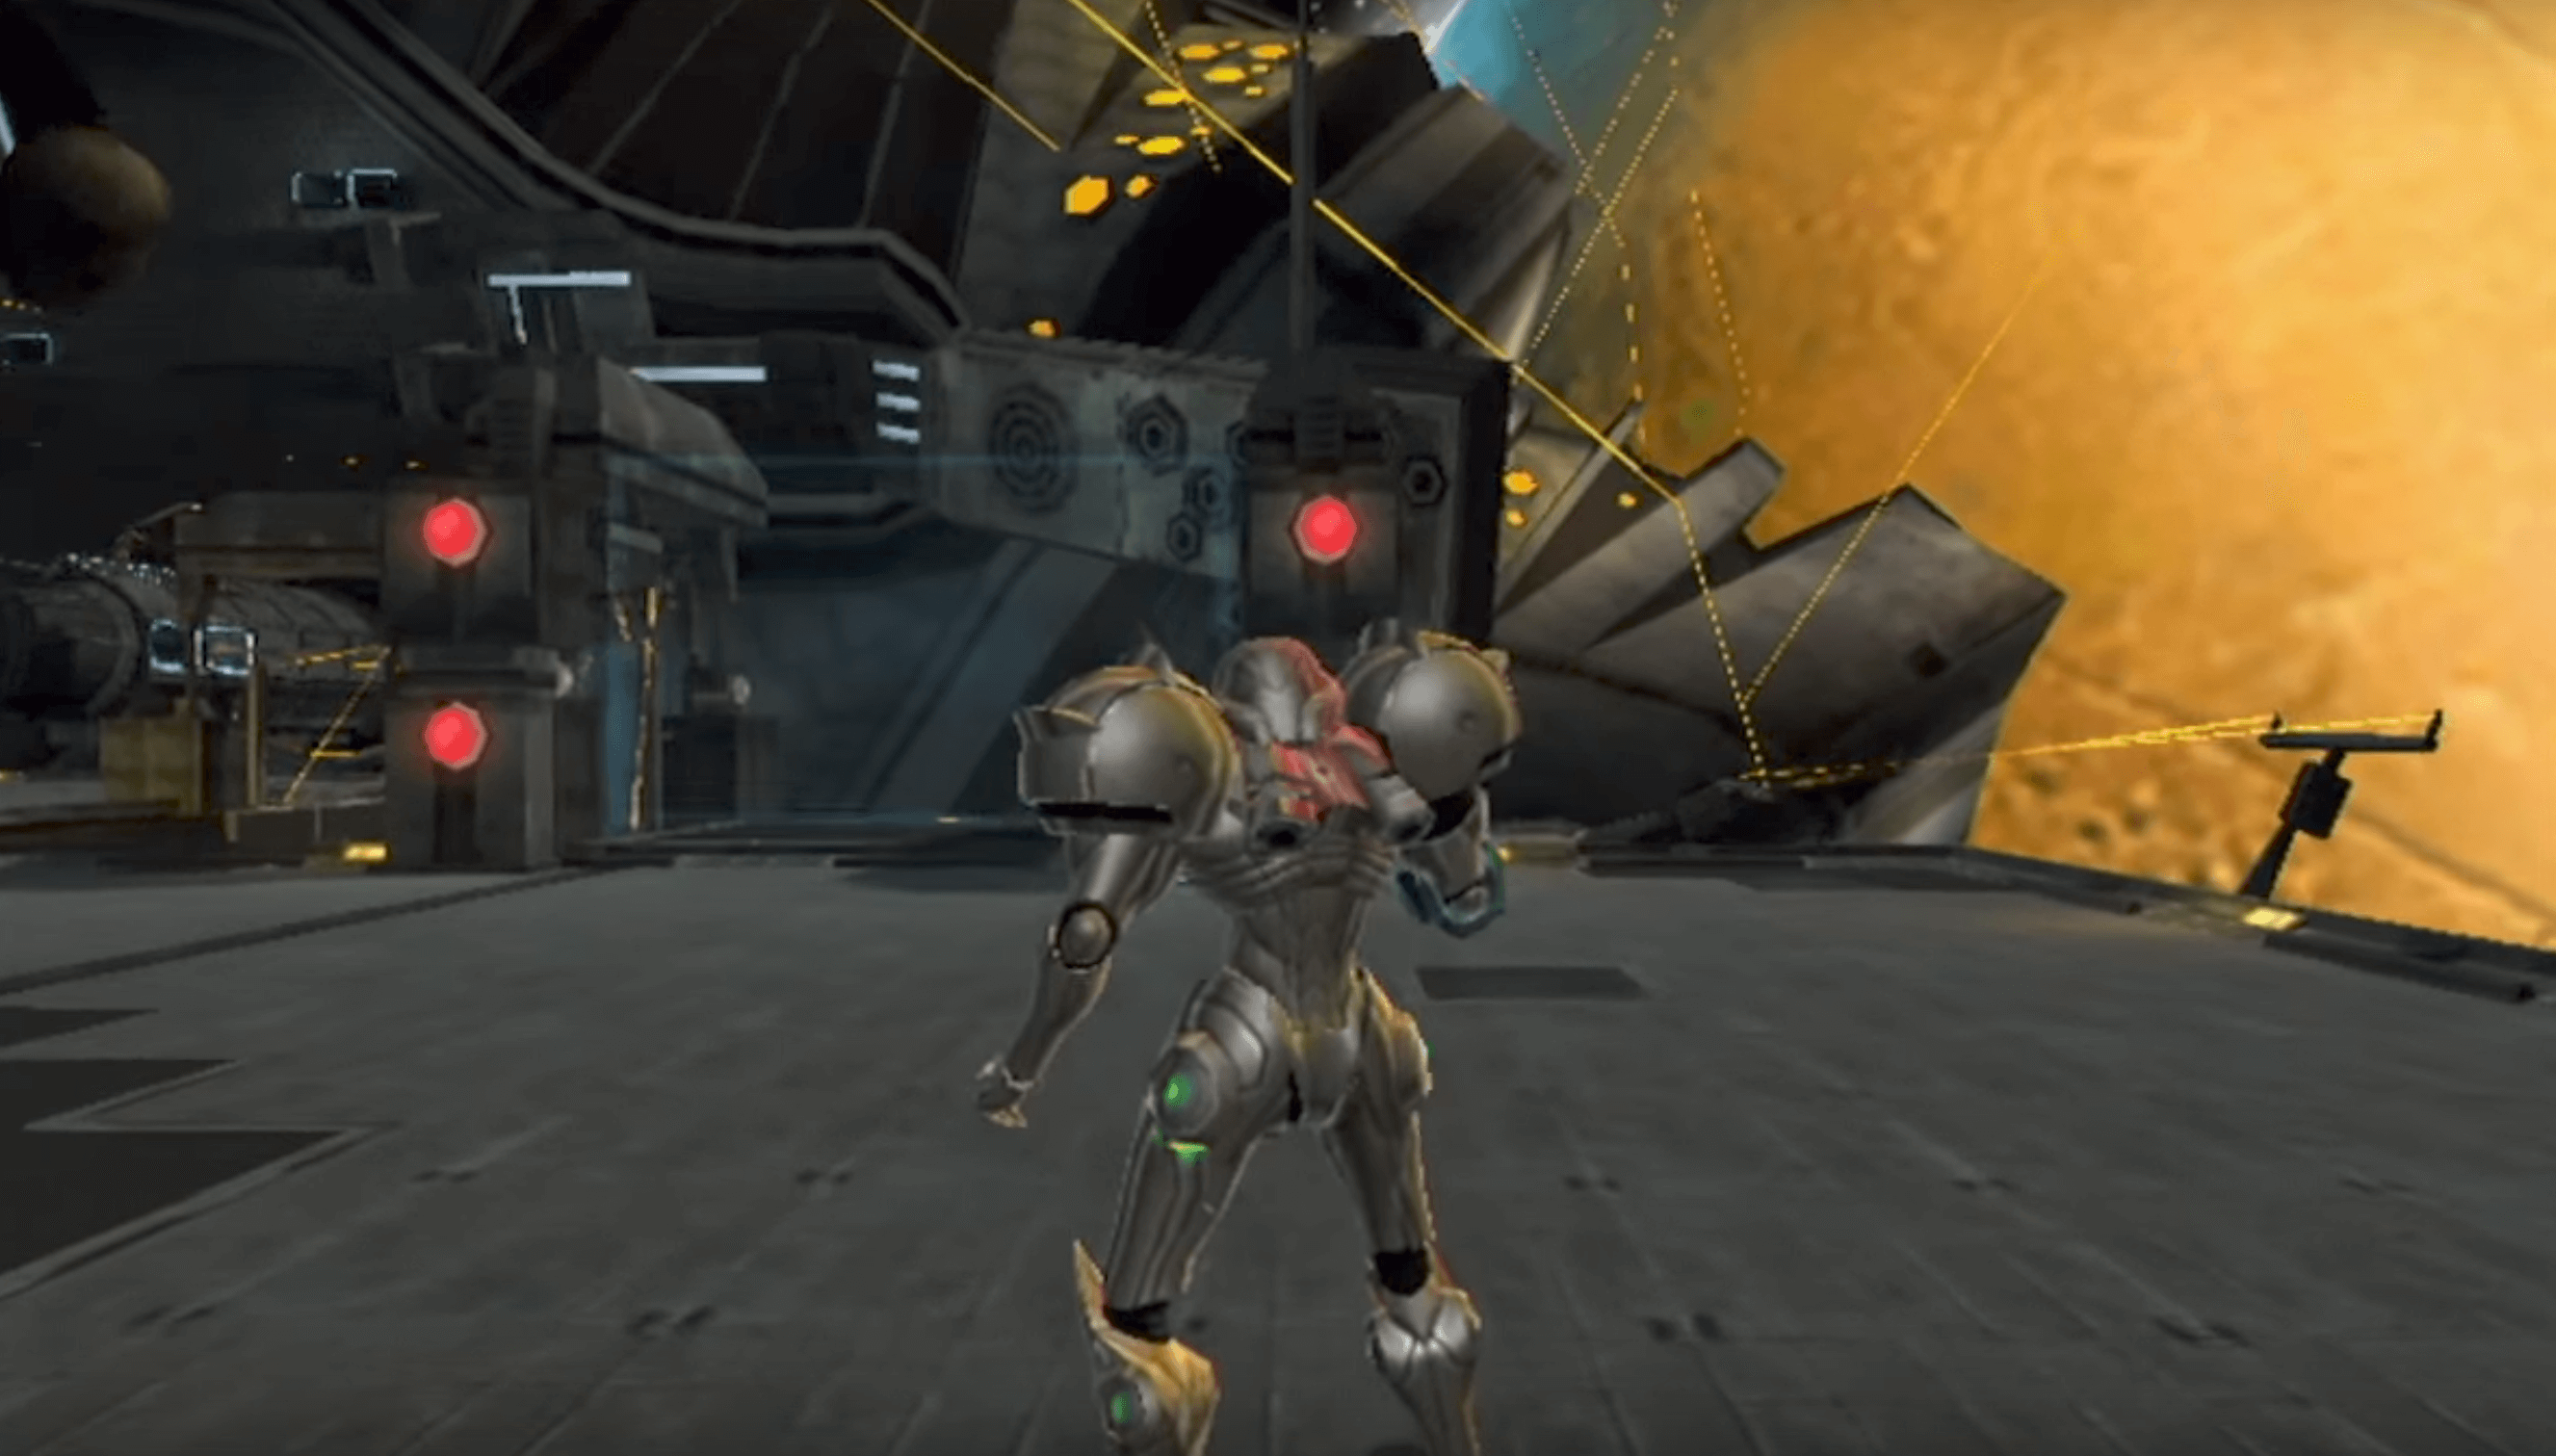 Frigate Orpheon Metroid Prime Metroid Story